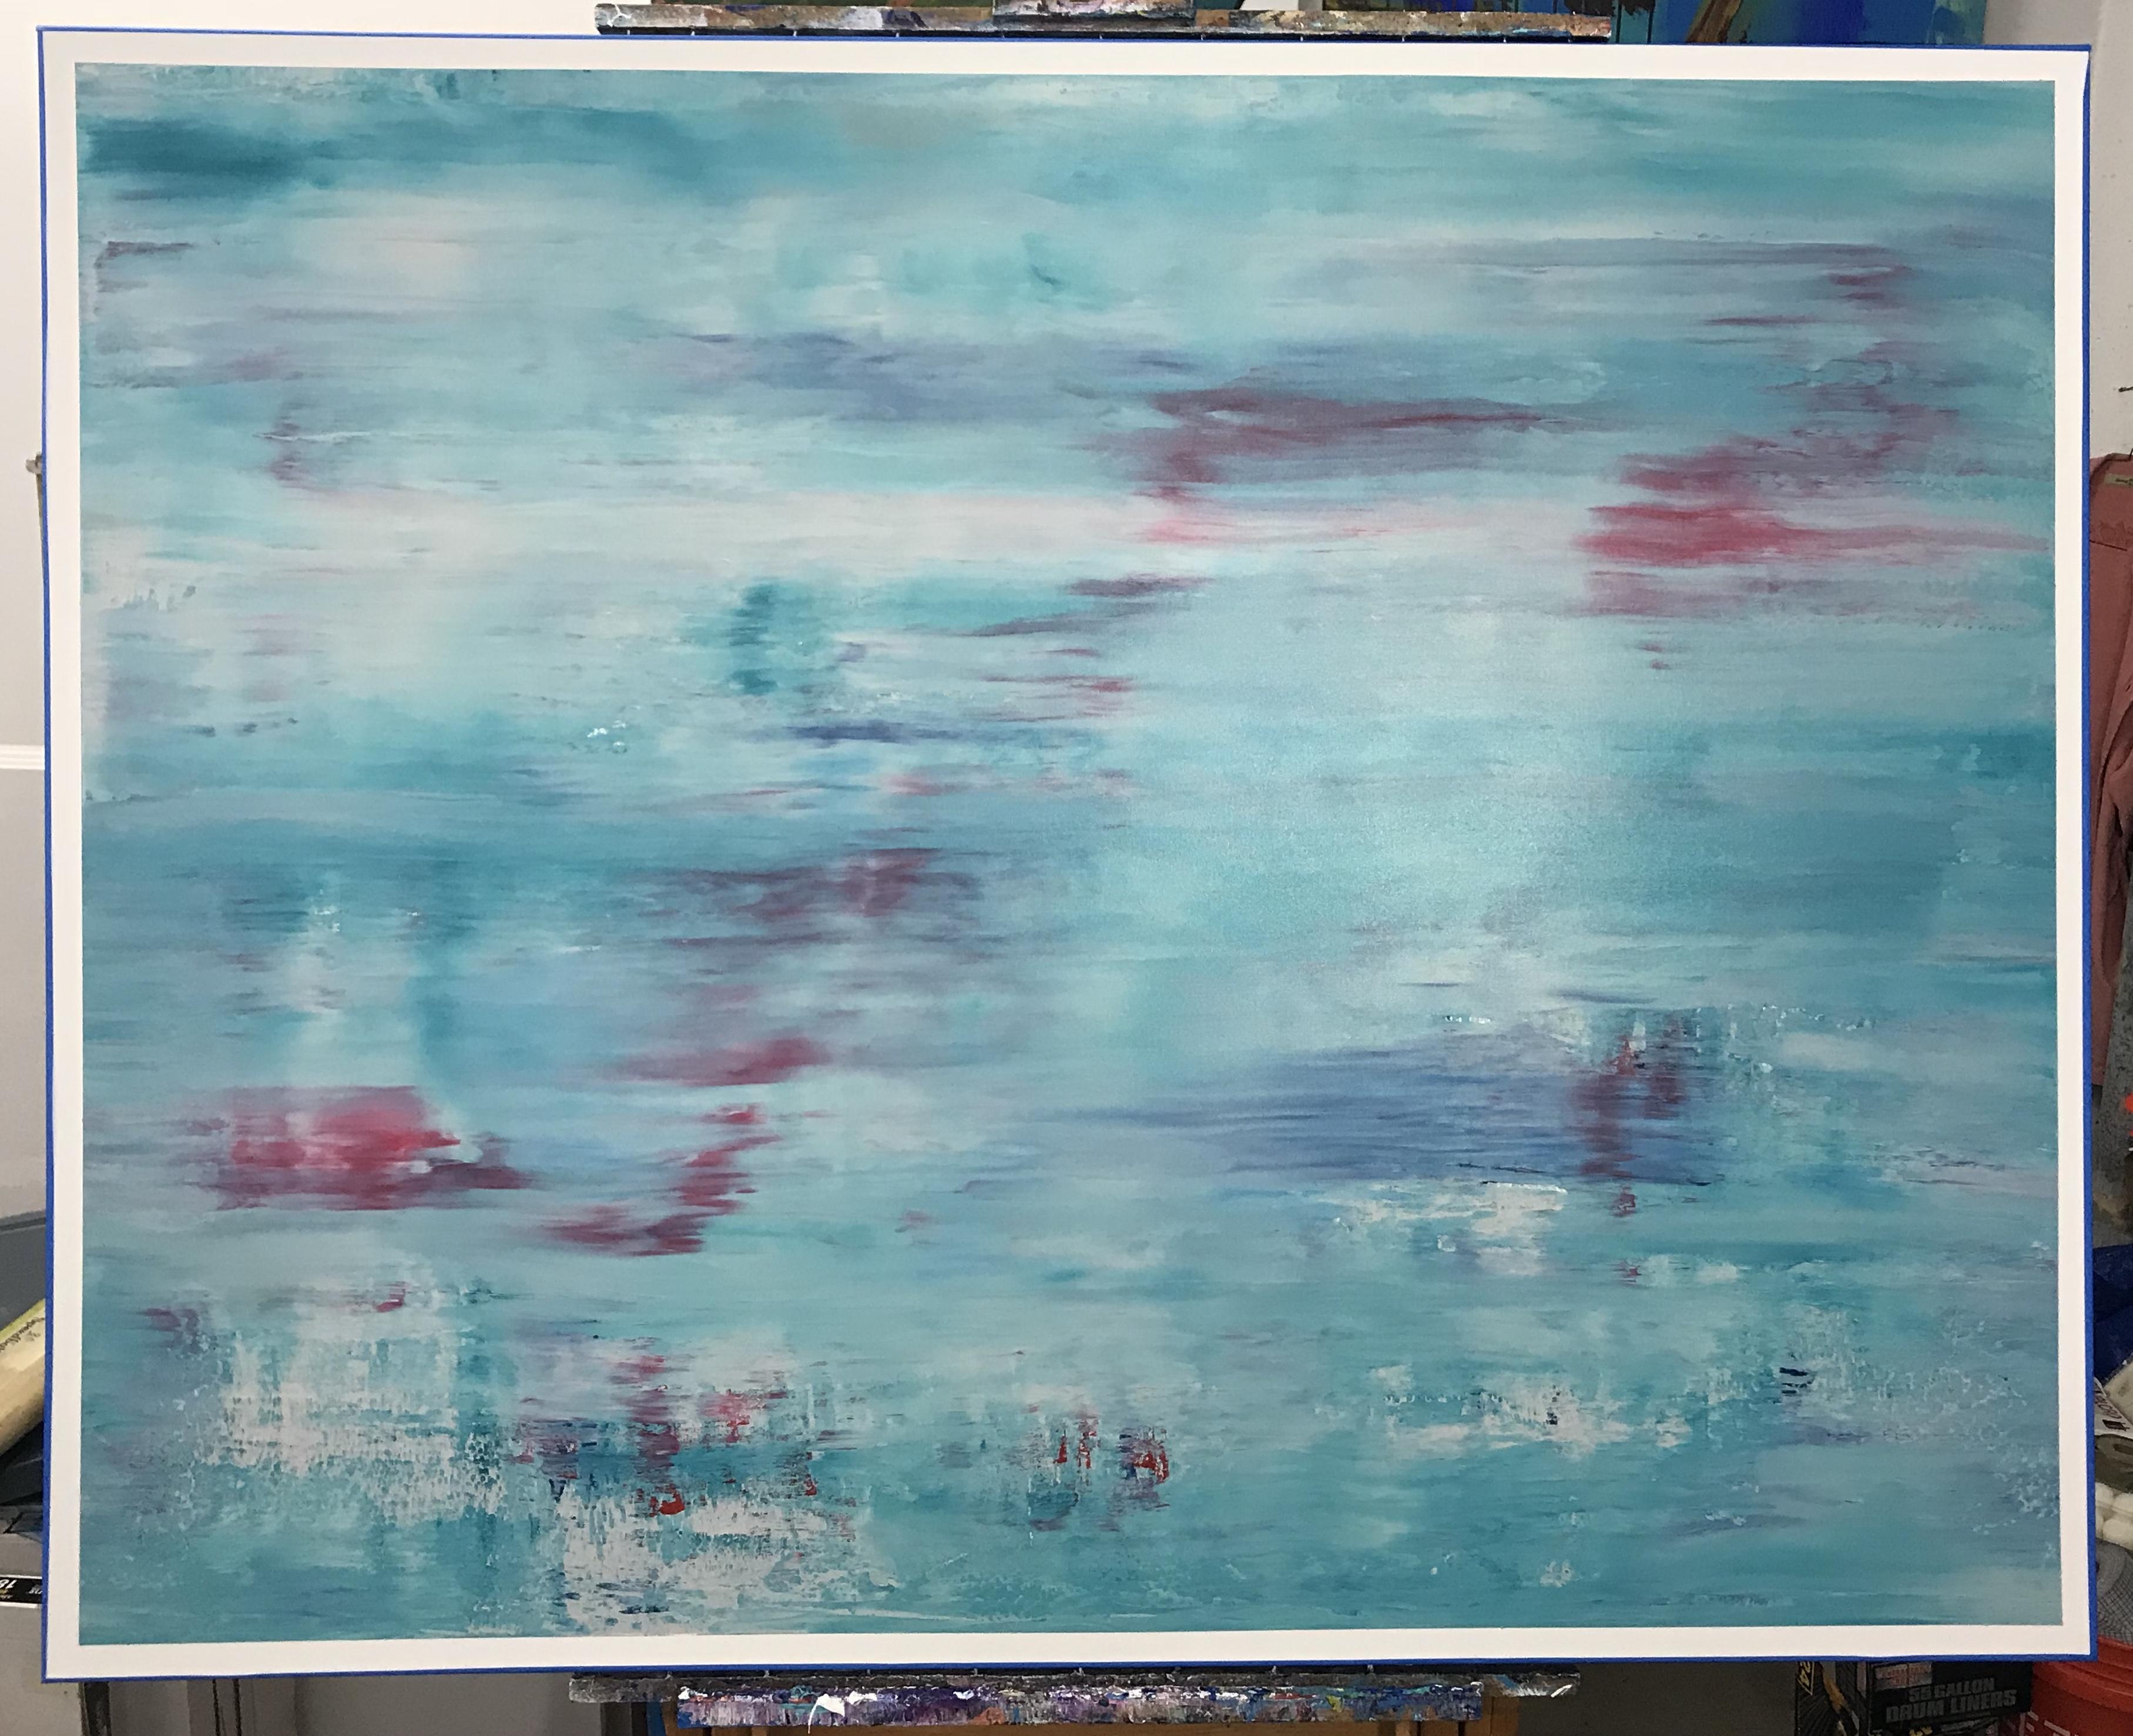 Reflections - Koi Pond